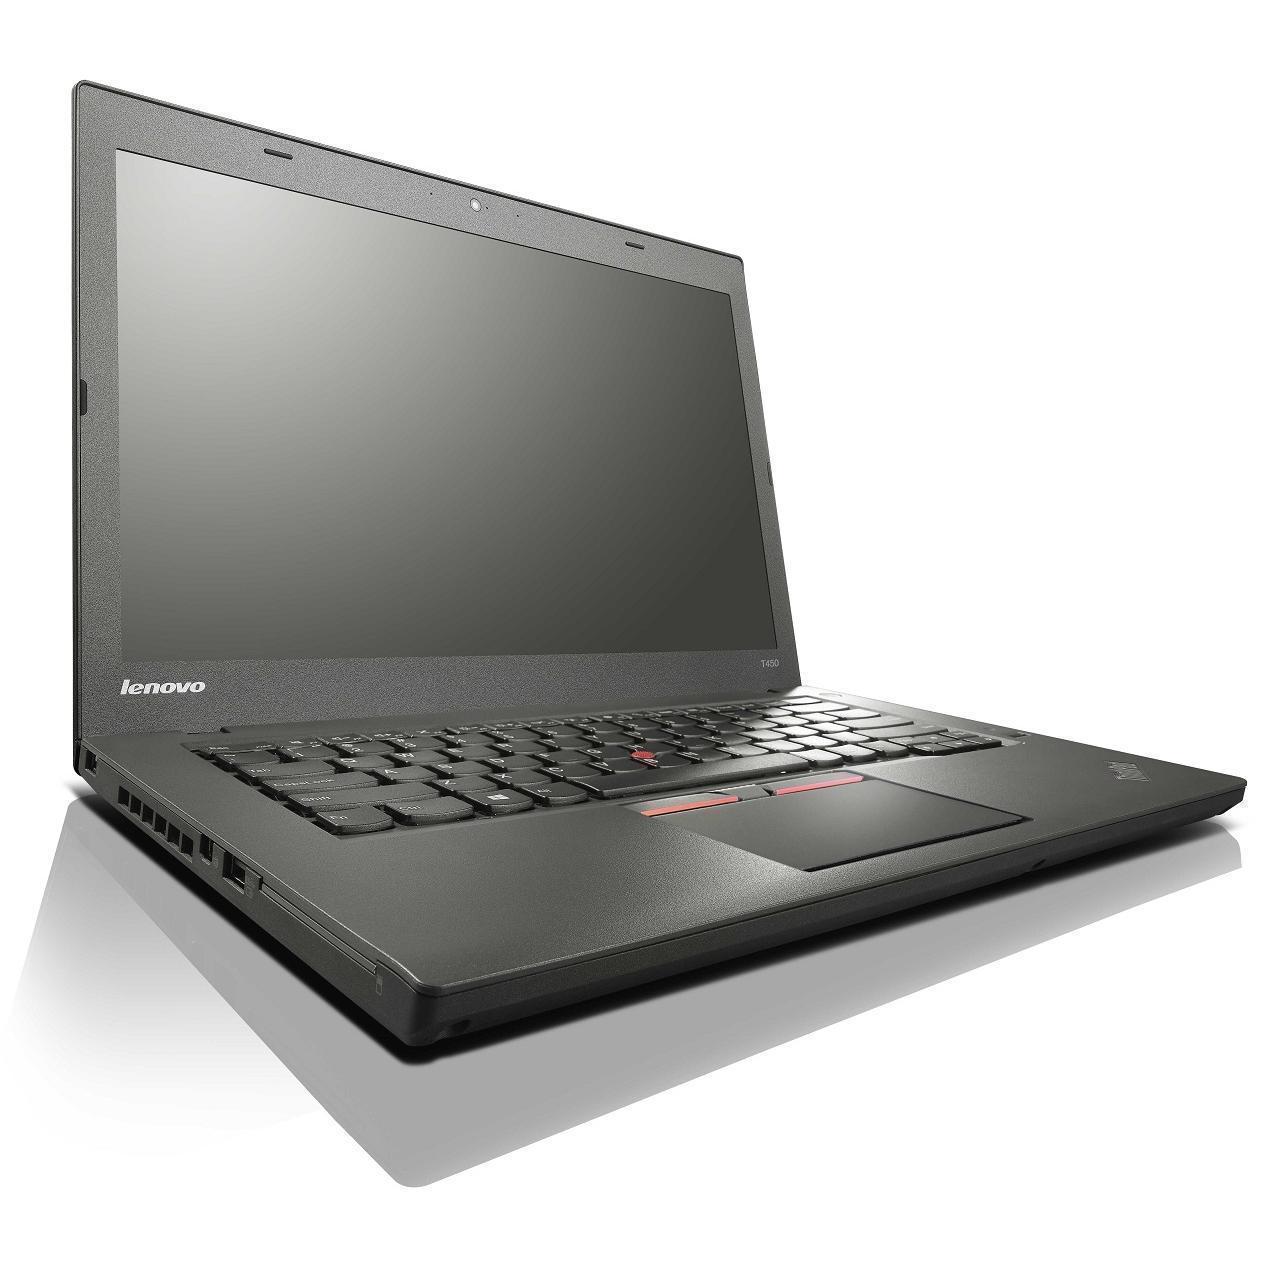 "Lenovo T450 14""(2015) - Core i5-5300U - 8GB - SSD 128 Gb AZERTY - Γαλλικό"